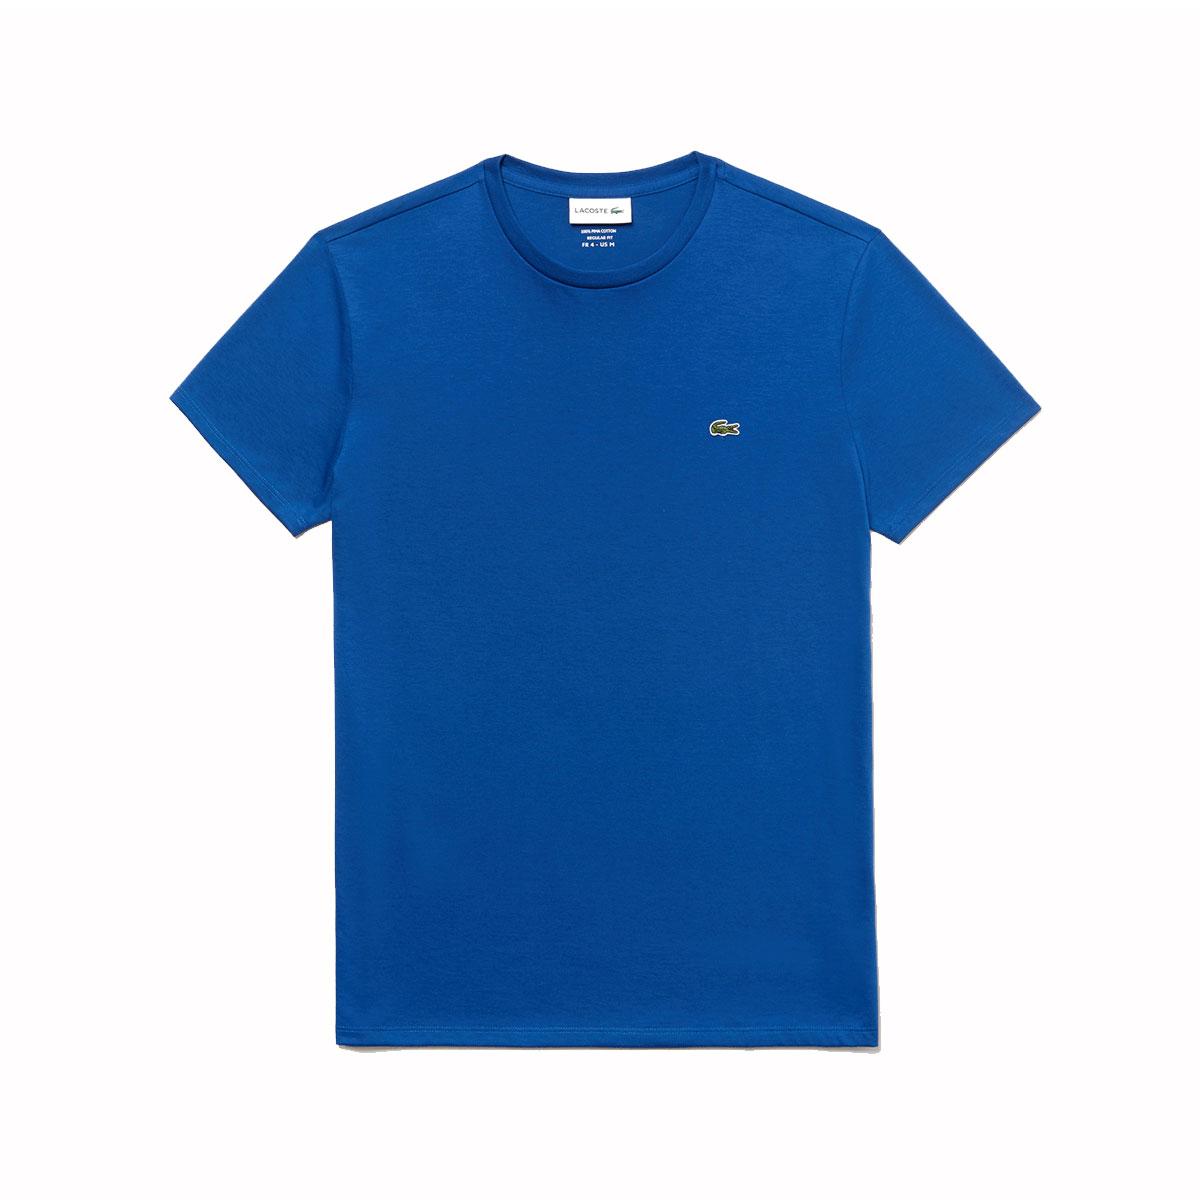 T-shirt da uomo, Lacoste